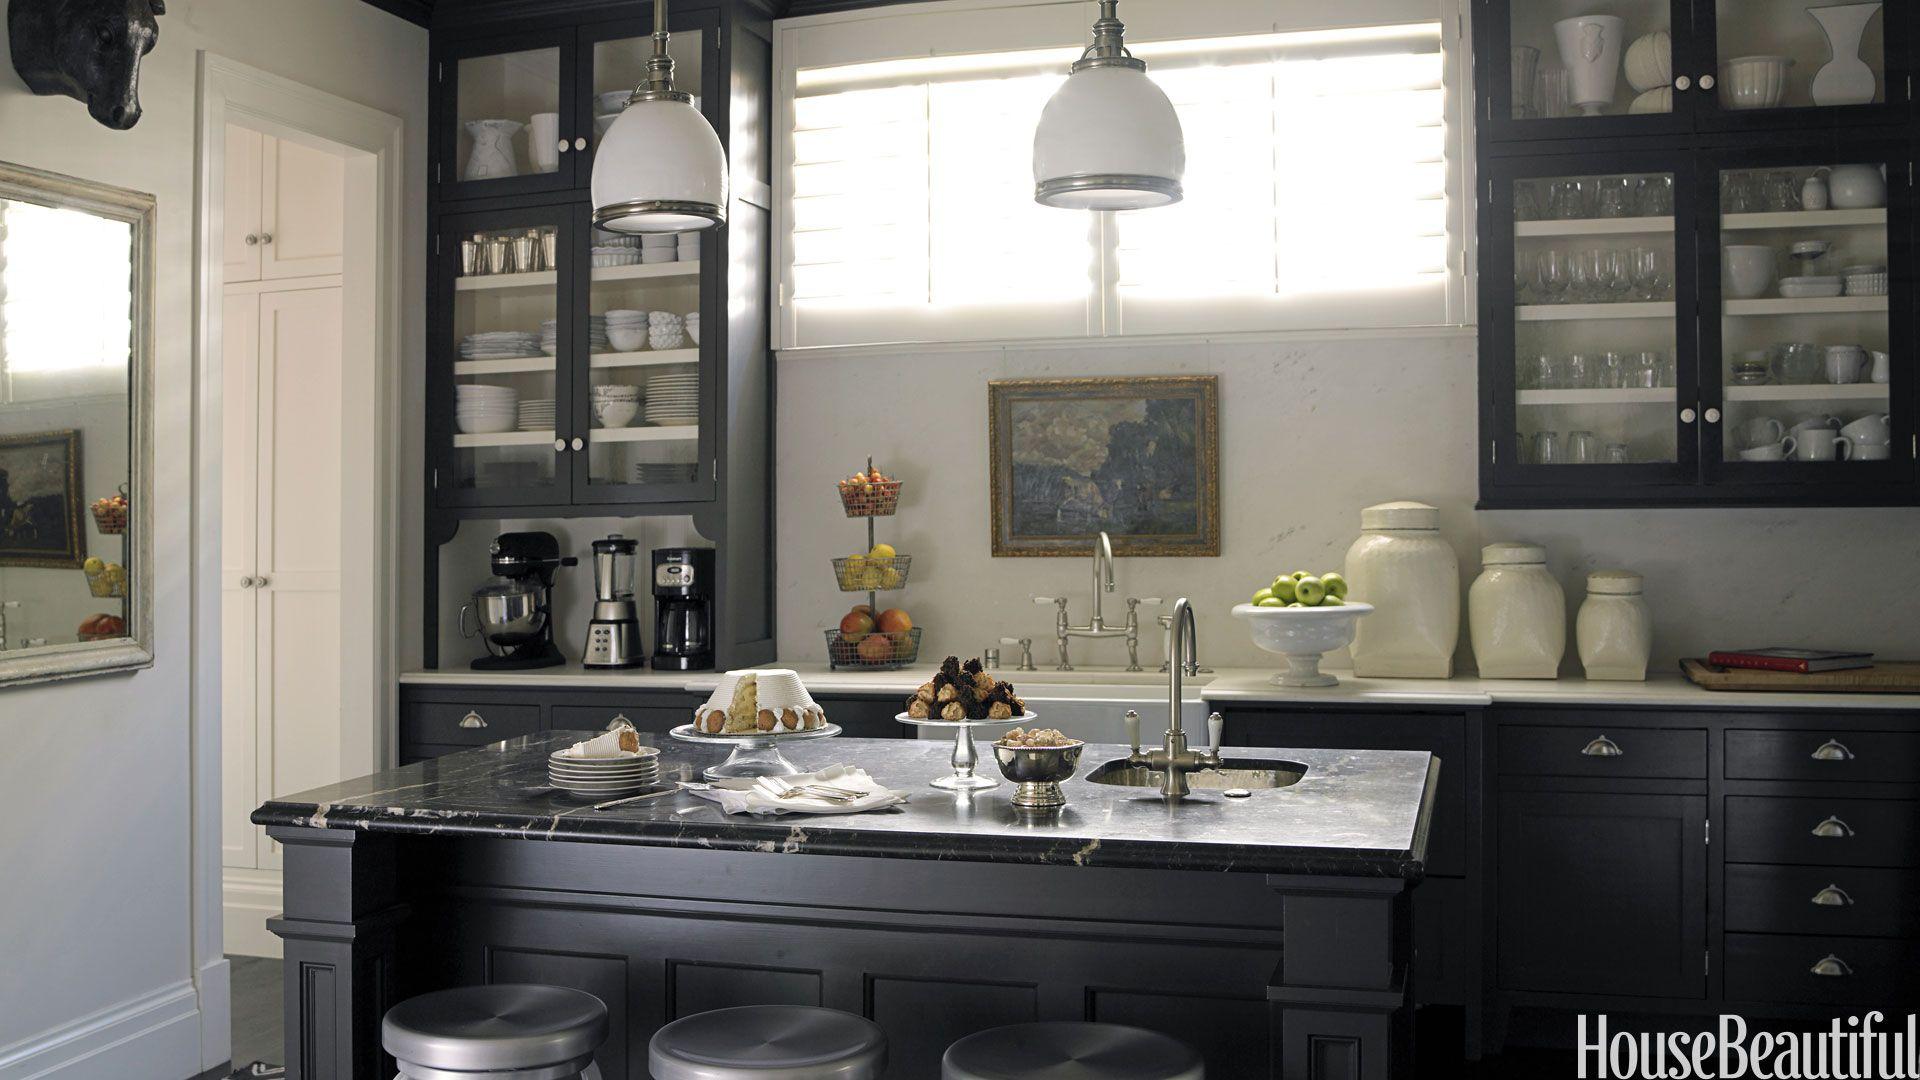 Www.housebeautiful.com Classy 20 Best Kitchen Paint Colors  Ideas For Popular Kitchen Colors Decorating Design